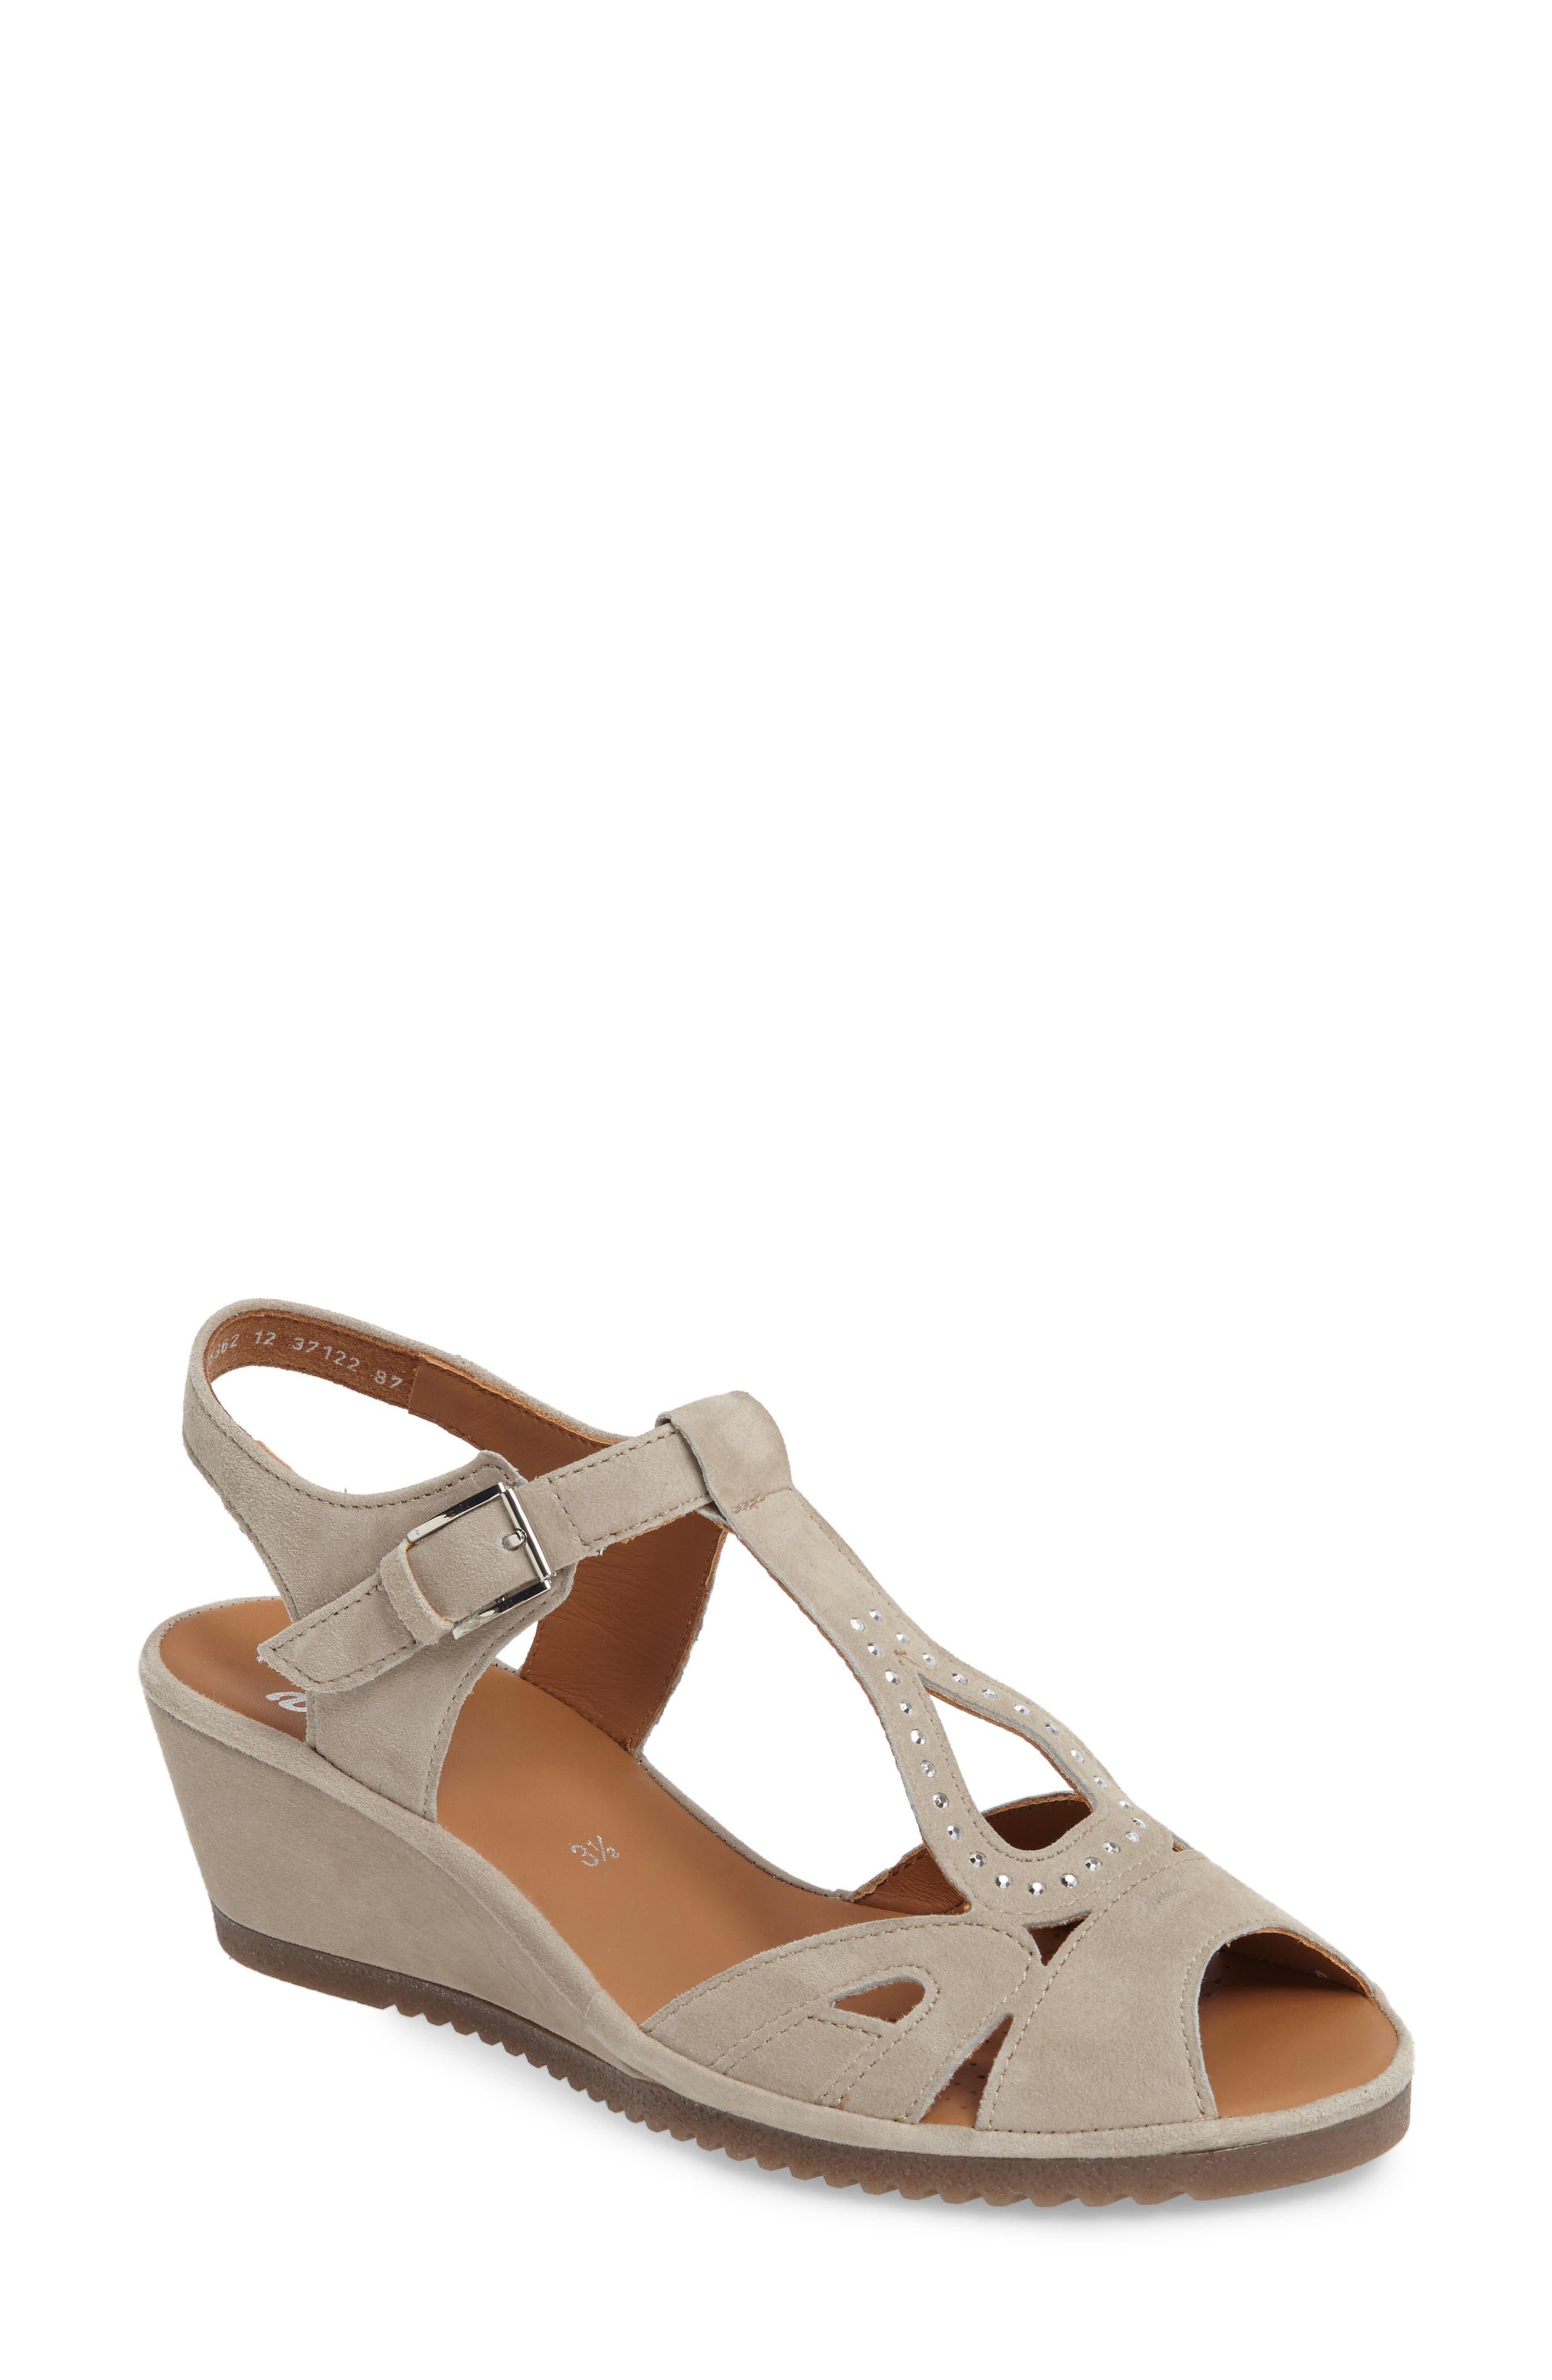 Main Image - ara Wedge Sandal (Women)